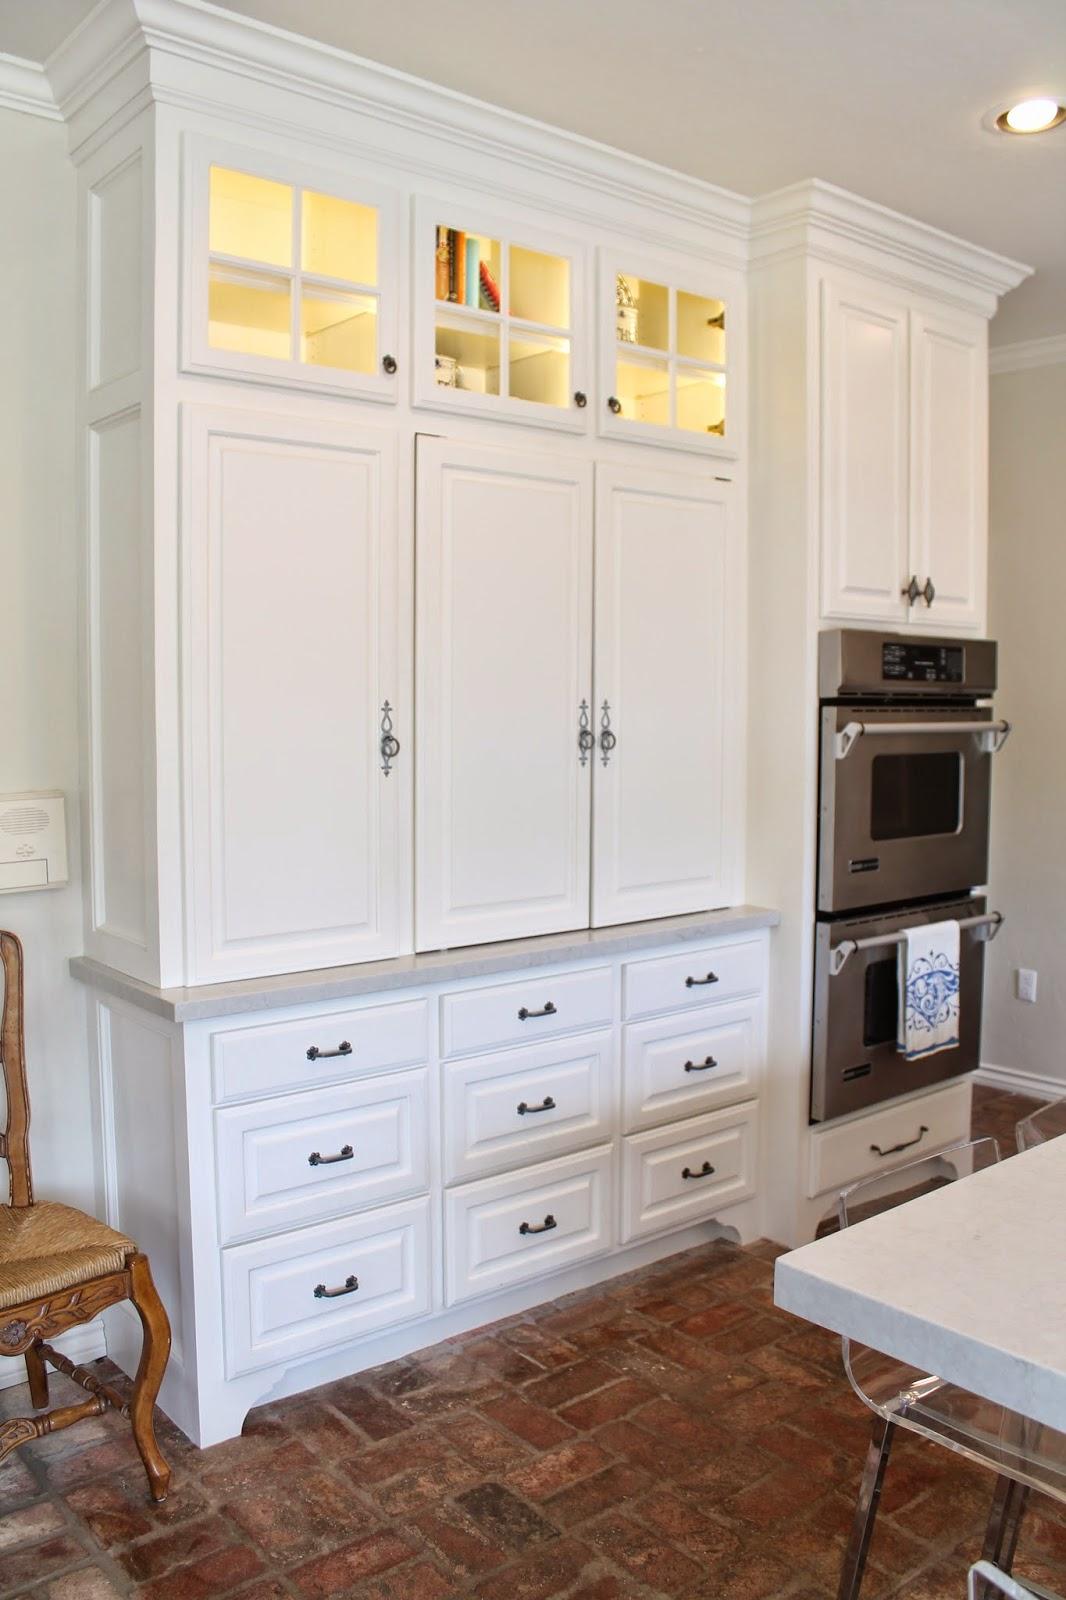 Benjamin Moore White Dove Kitchen Cabinets Eleven Gables Hidden Appliance Cabinet And Desk Command